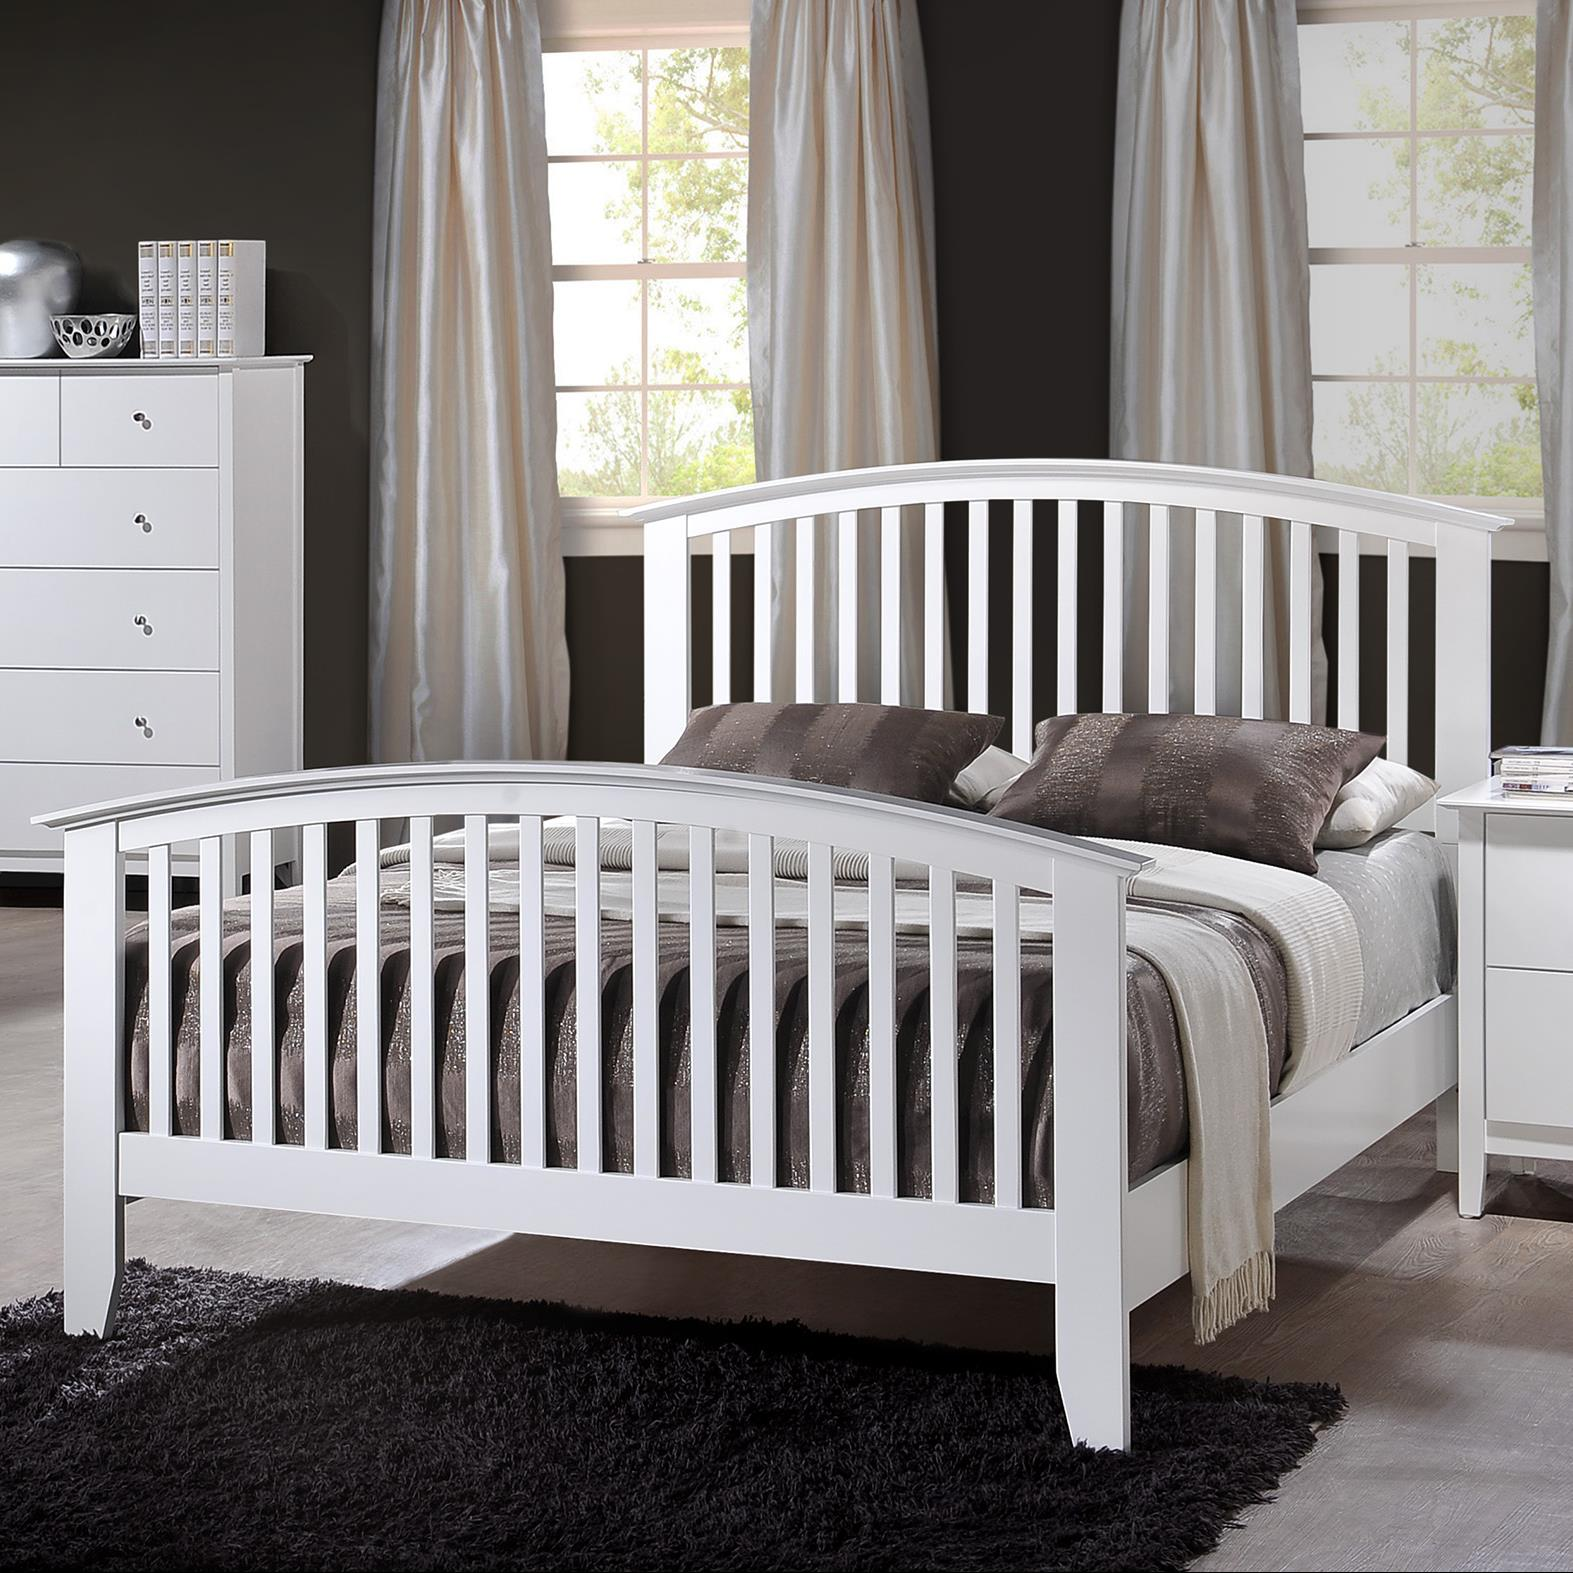 Crown Mark Lawson Full Slat Bed - Item Number: B7500-F-HBFB+FT-RAIL